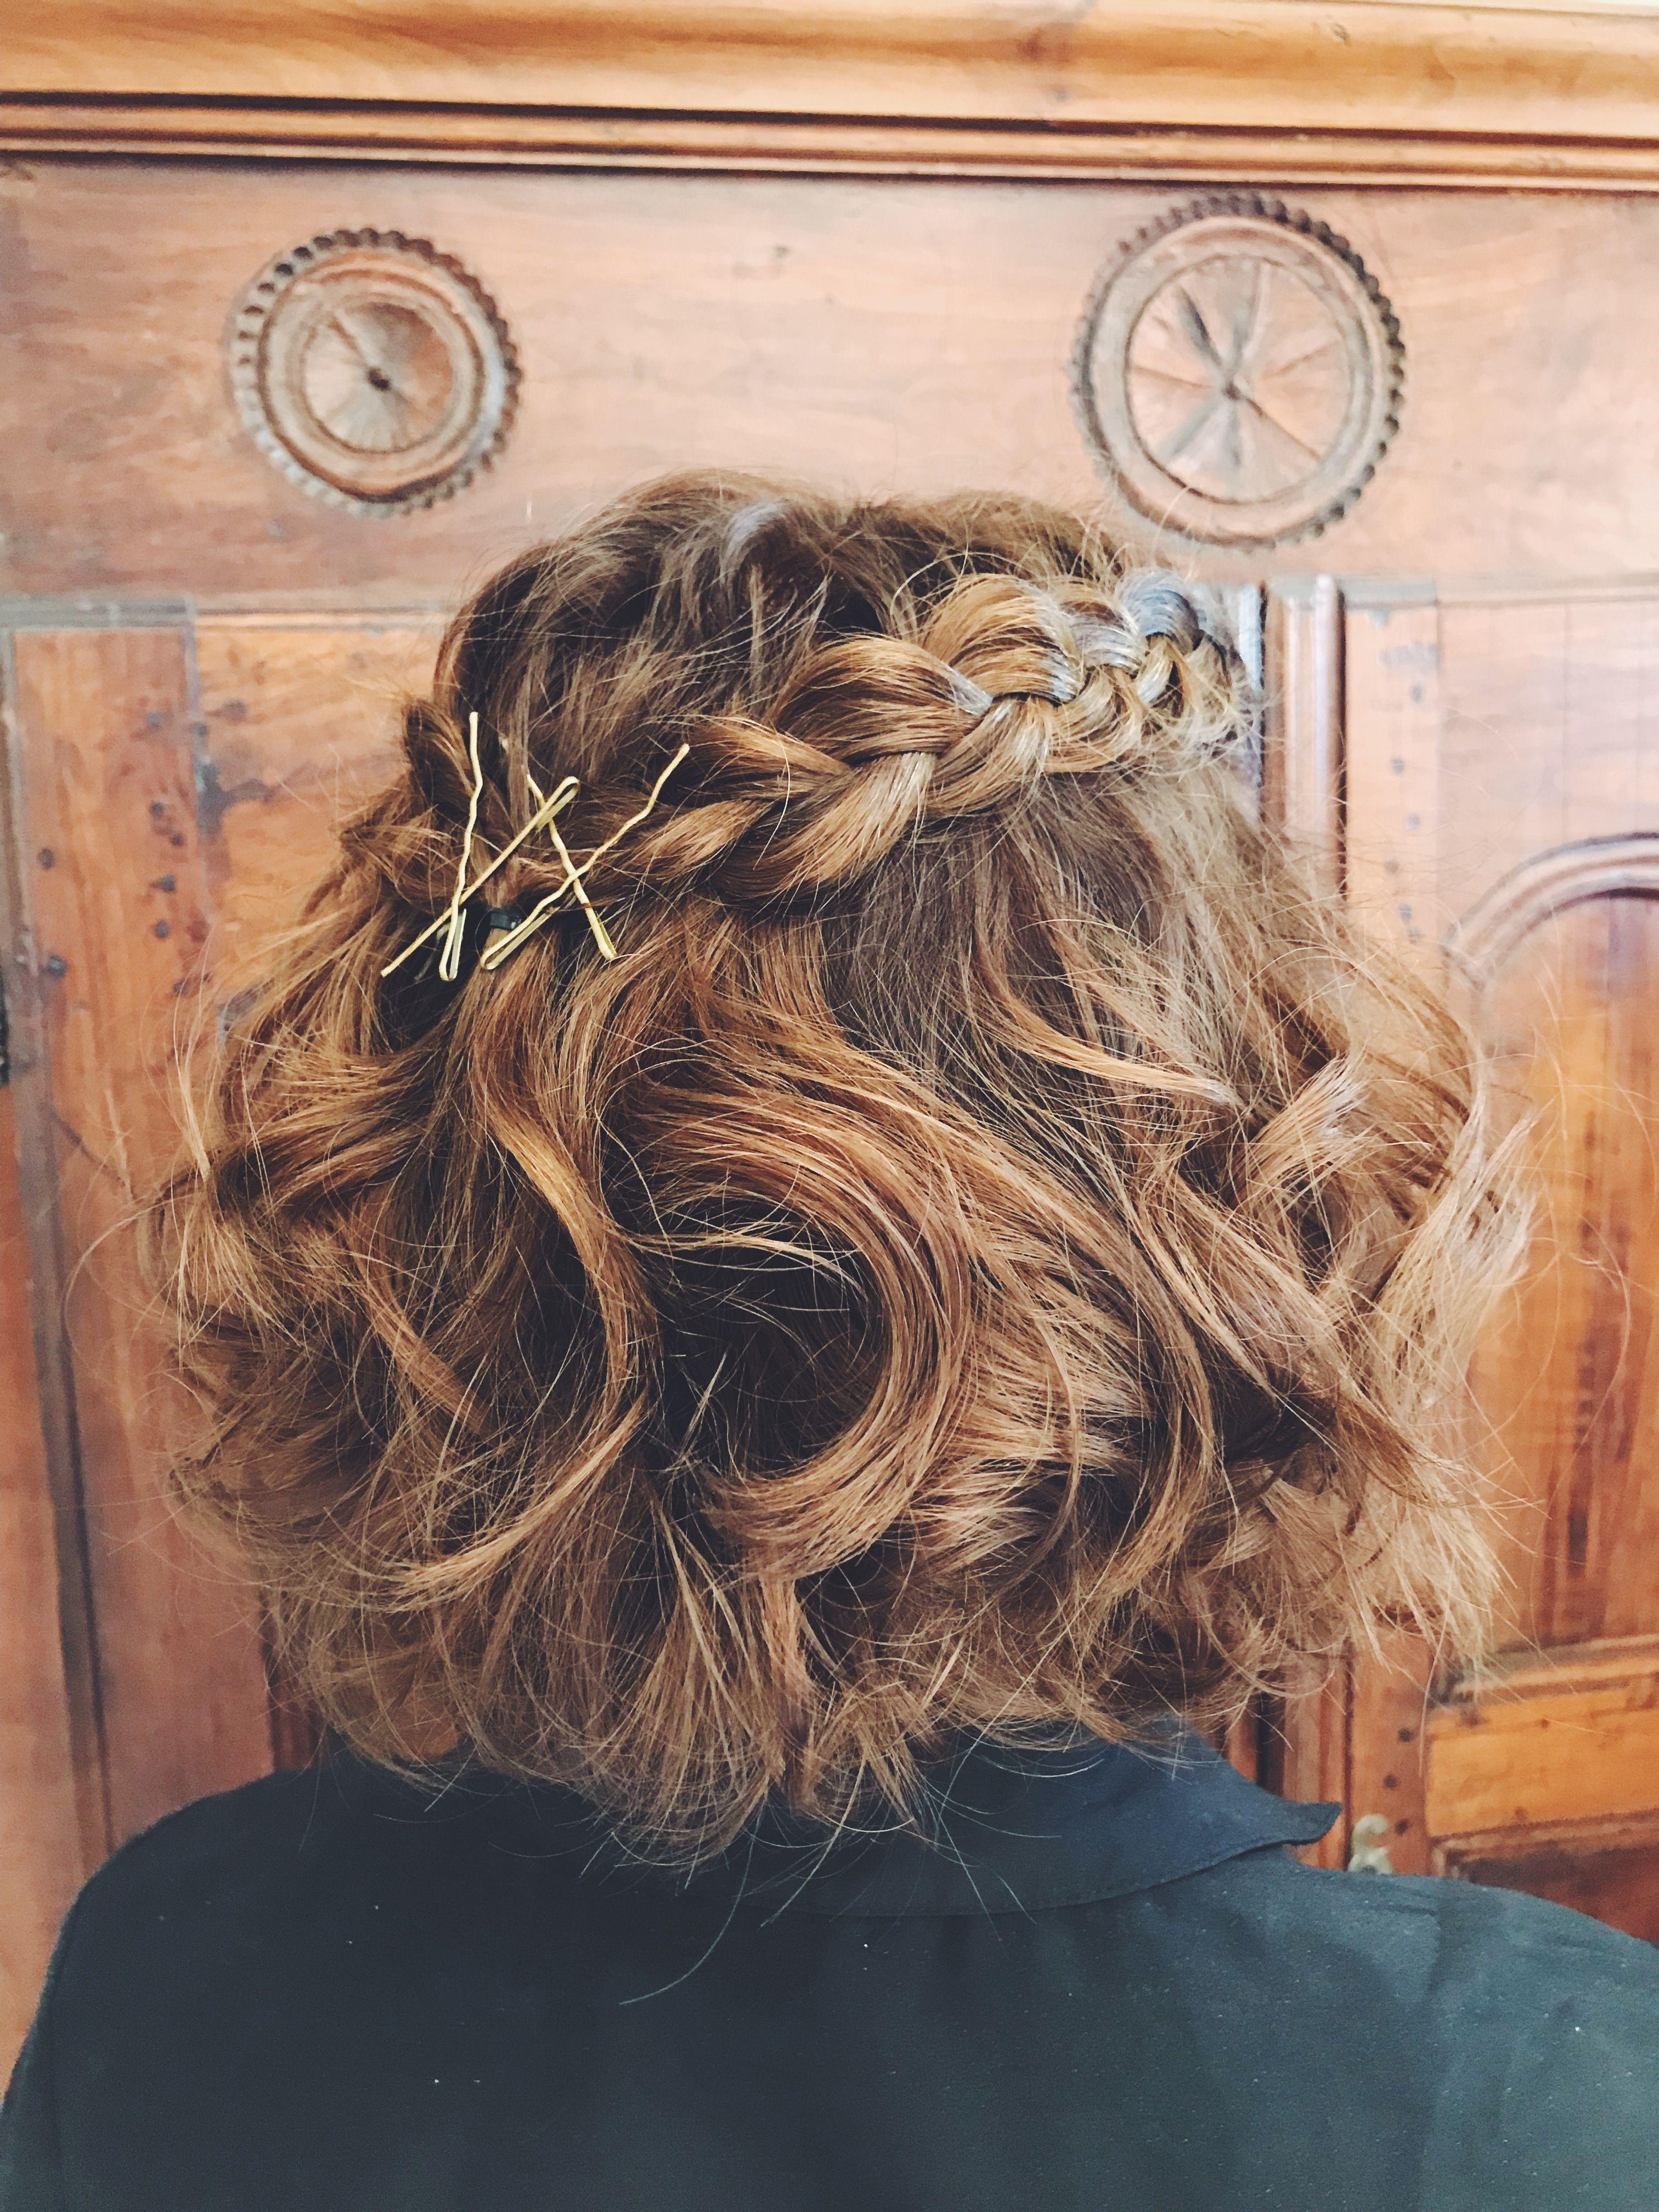 19+ Coiffure wavy pour mariage des idees